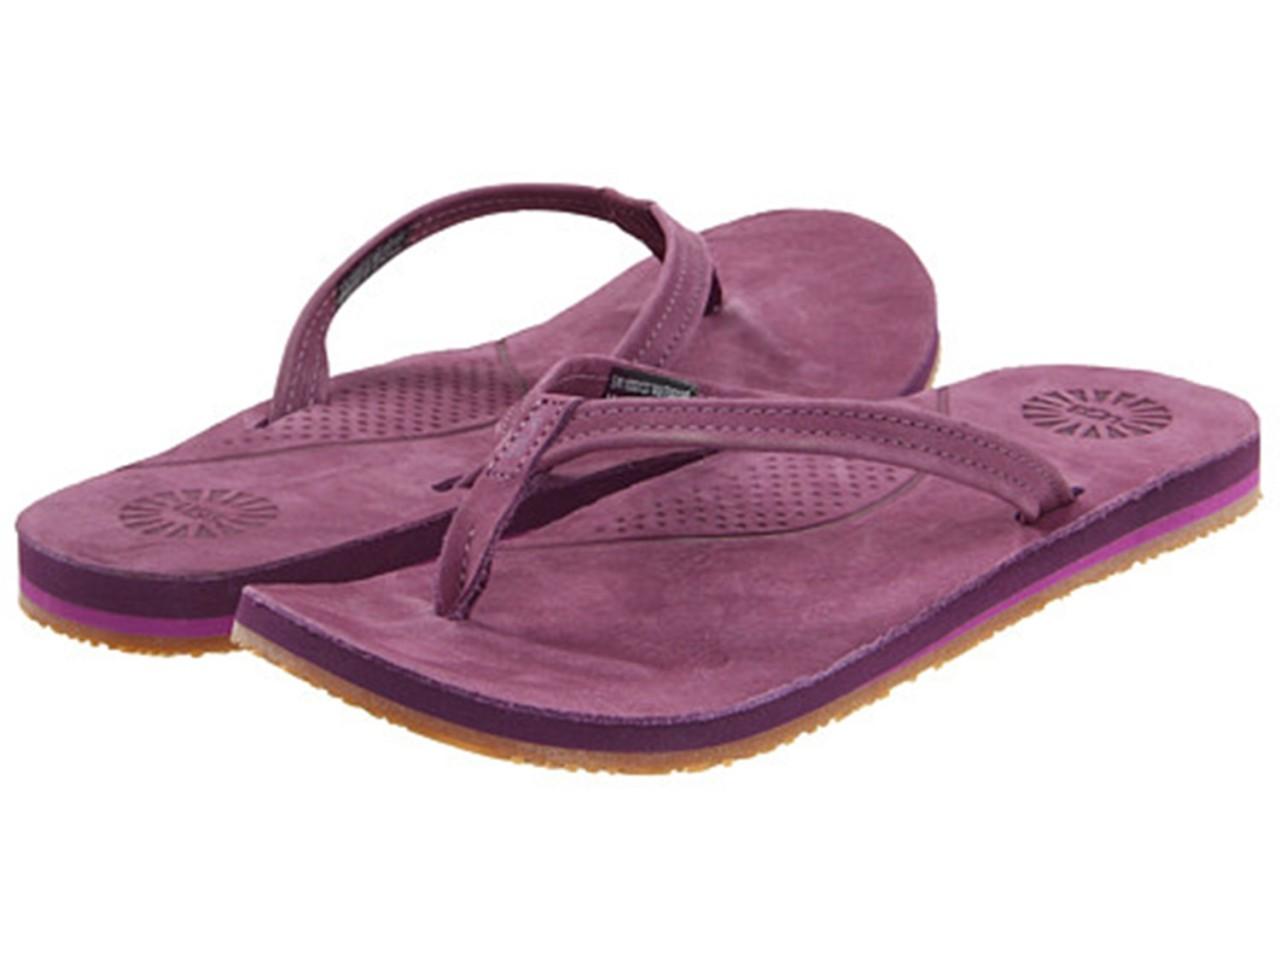 women 39 s shoes ugg australia kayla flip flop sandals leather boysenberry purple. Black Bedroom Furniture Sets. Home Design Ideas